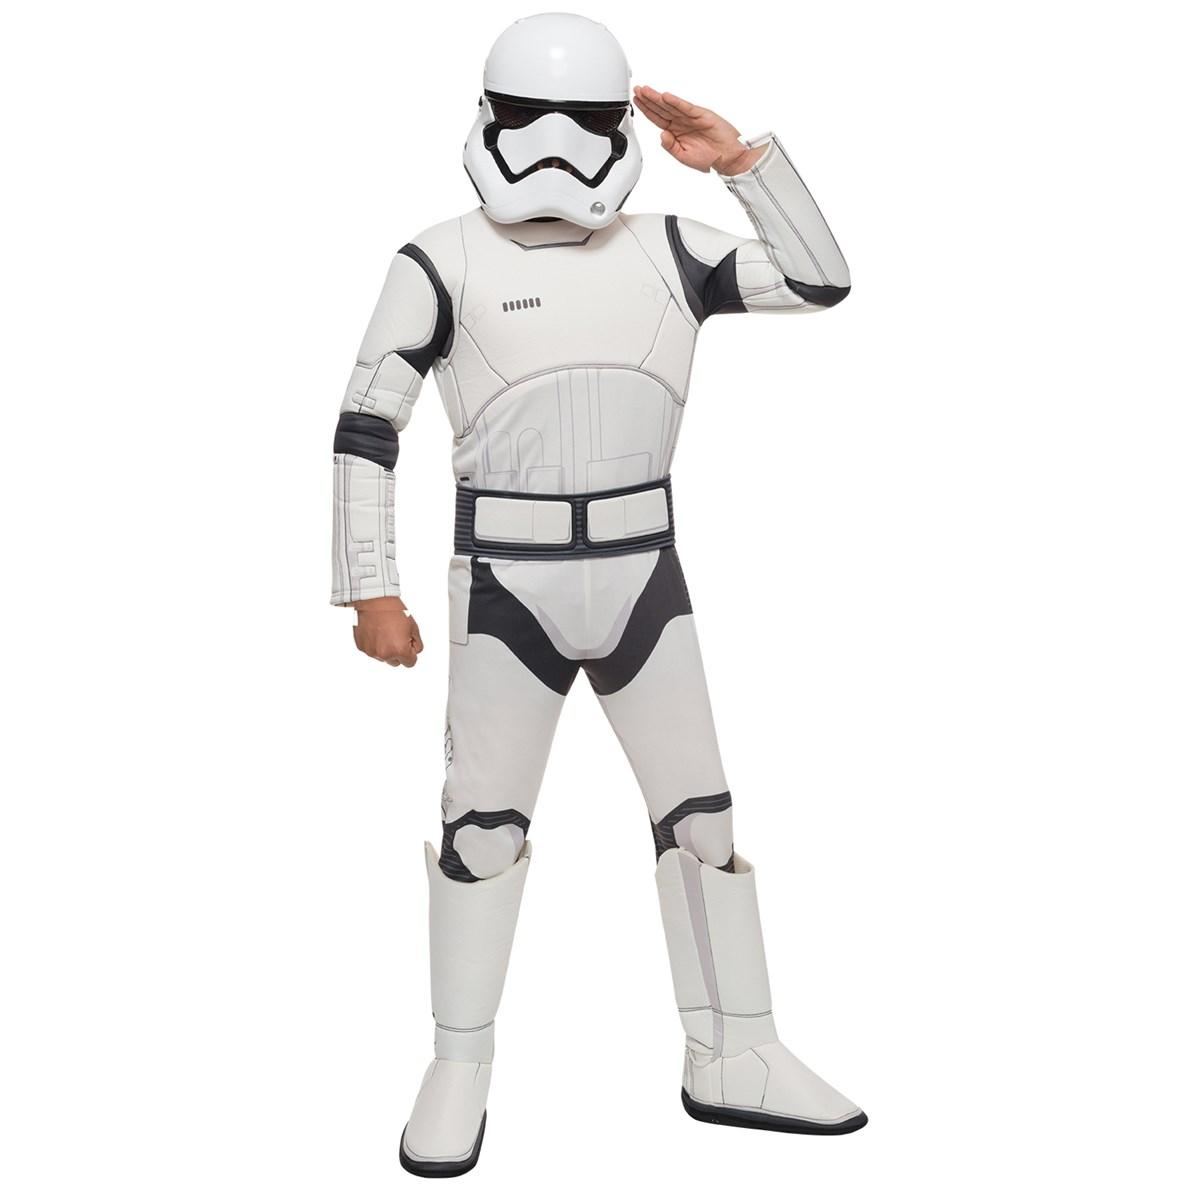 Star Wars: The Force Awakens - Boys Stormtrooper Deluxe Costume ...